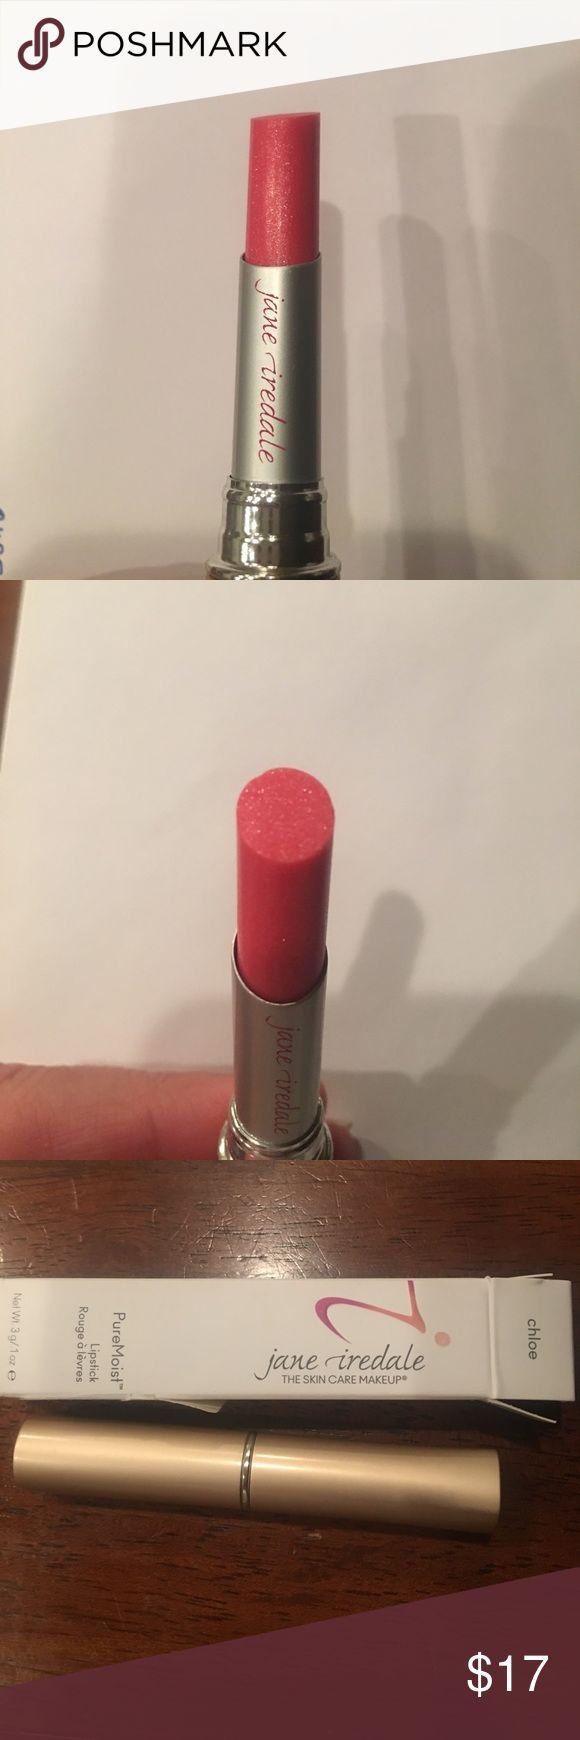 Jane Iredale PureMoist lipstick Chloe Brand new, untouched.  Jane Iredale PureMoist lipstick in Chloe.  SRP of $25. Jane Iredale Makeup Lipstick